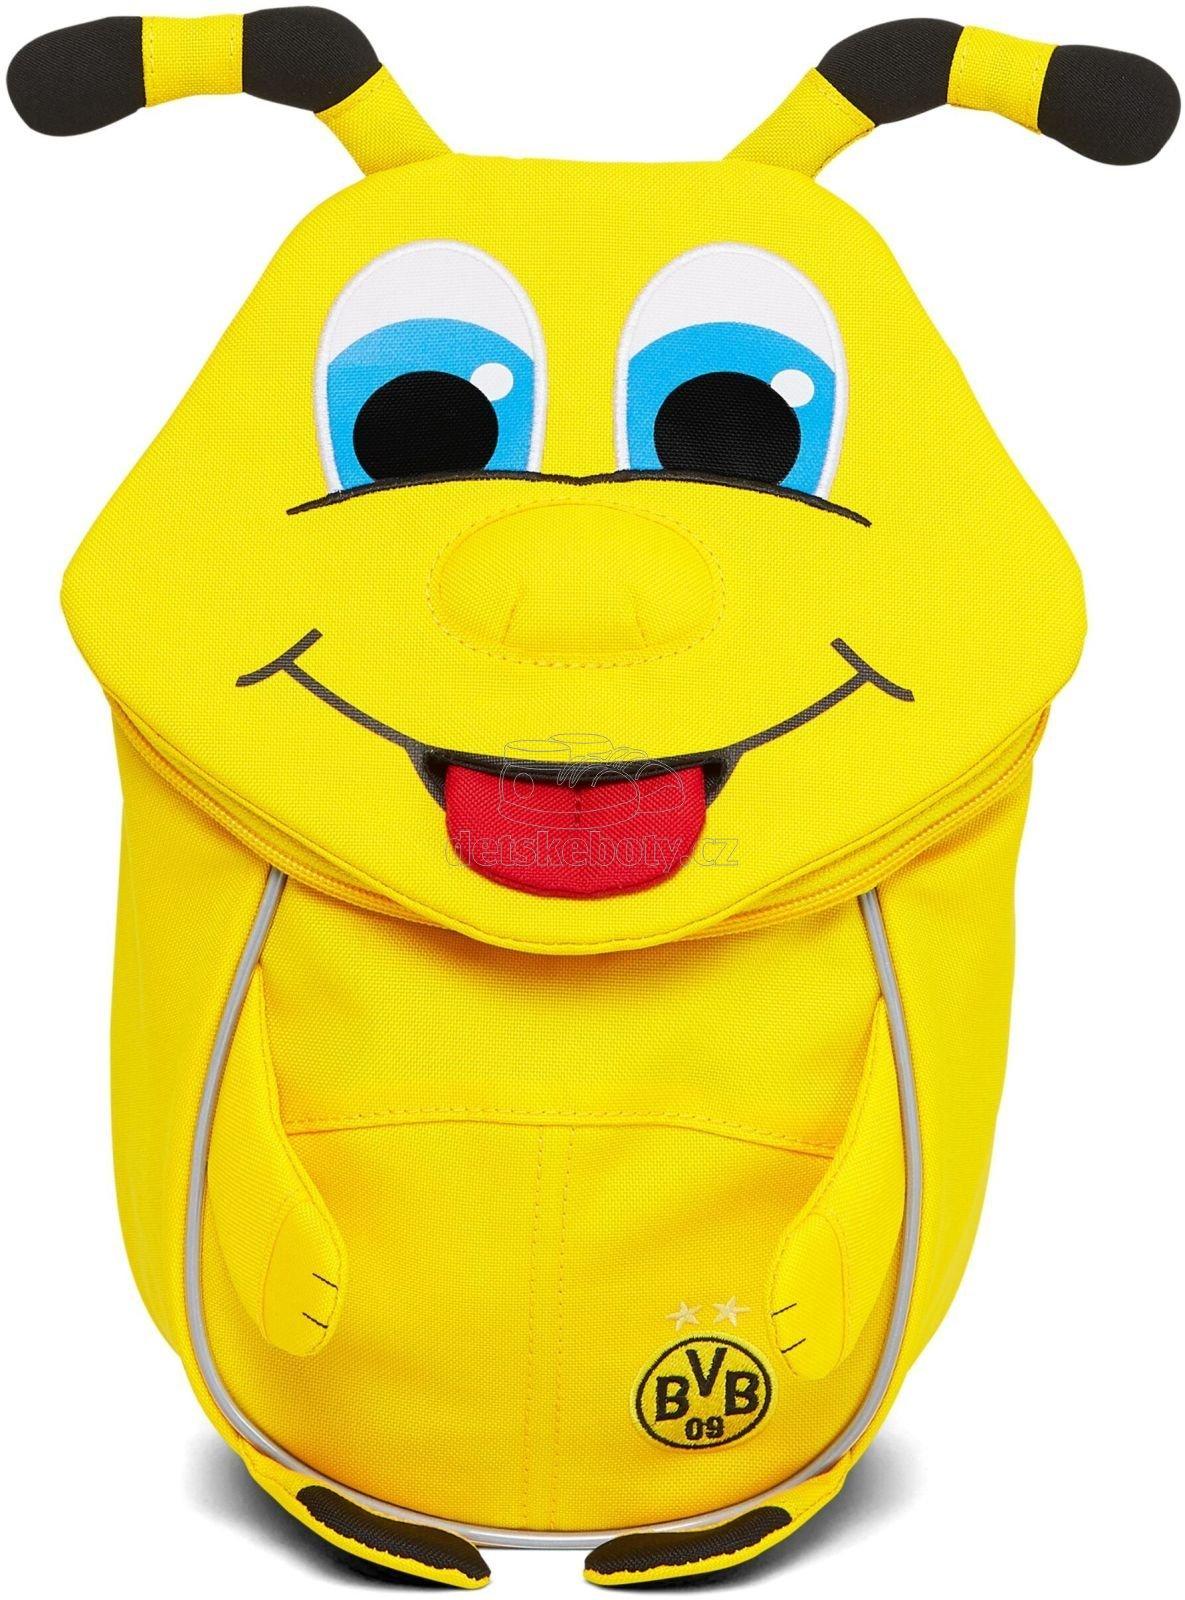 Batůžek pro nejmenší Affenzahn BVB Emma-yellow